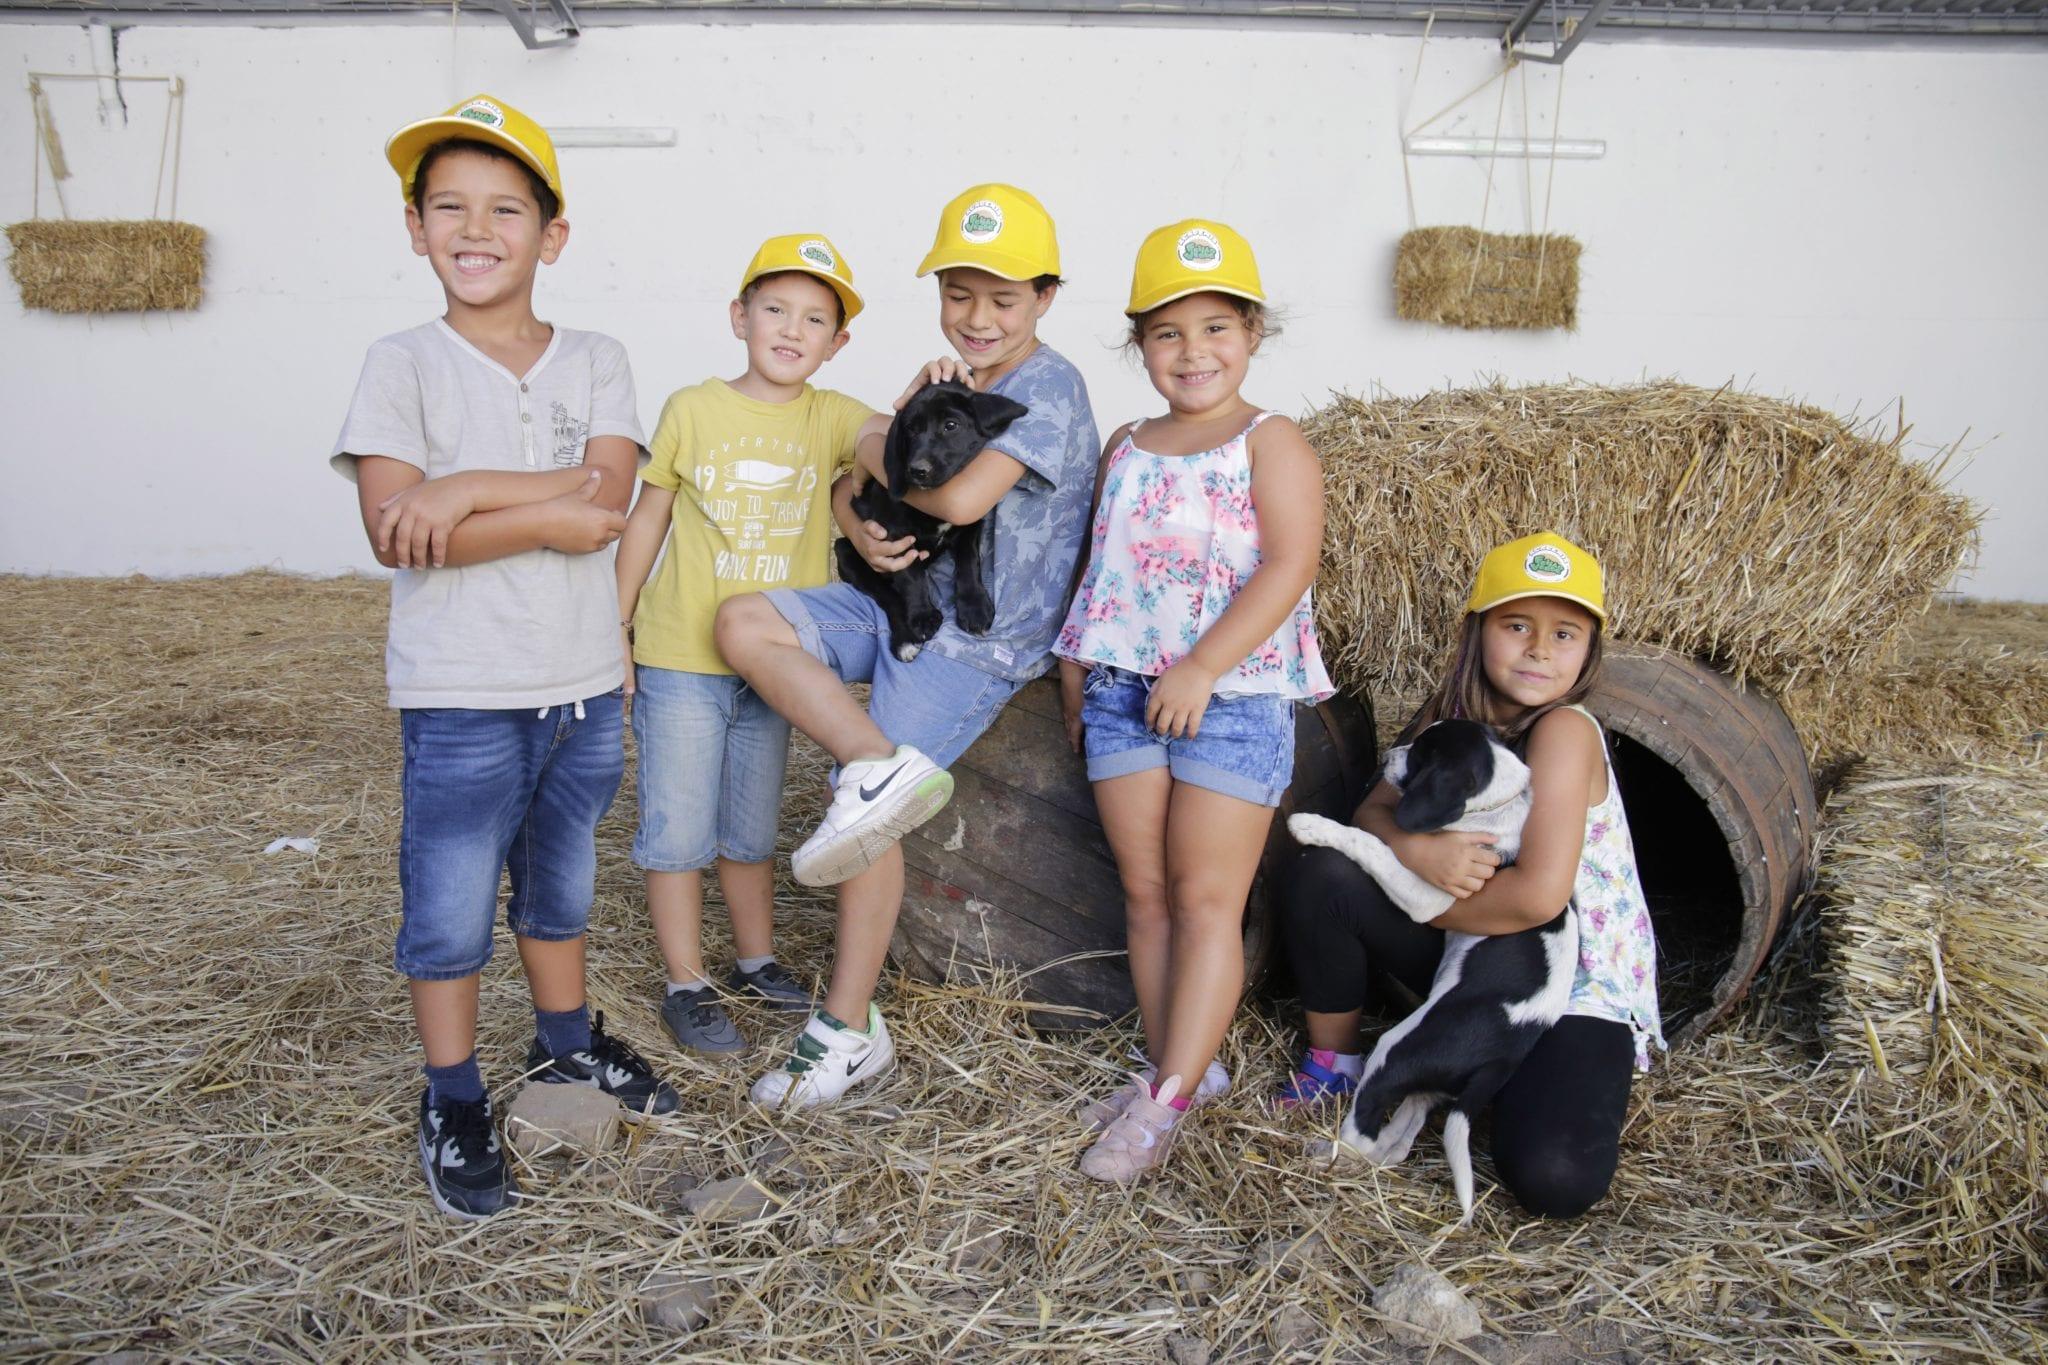 Feijão Verde Coimbra Visita aos animais da quinta